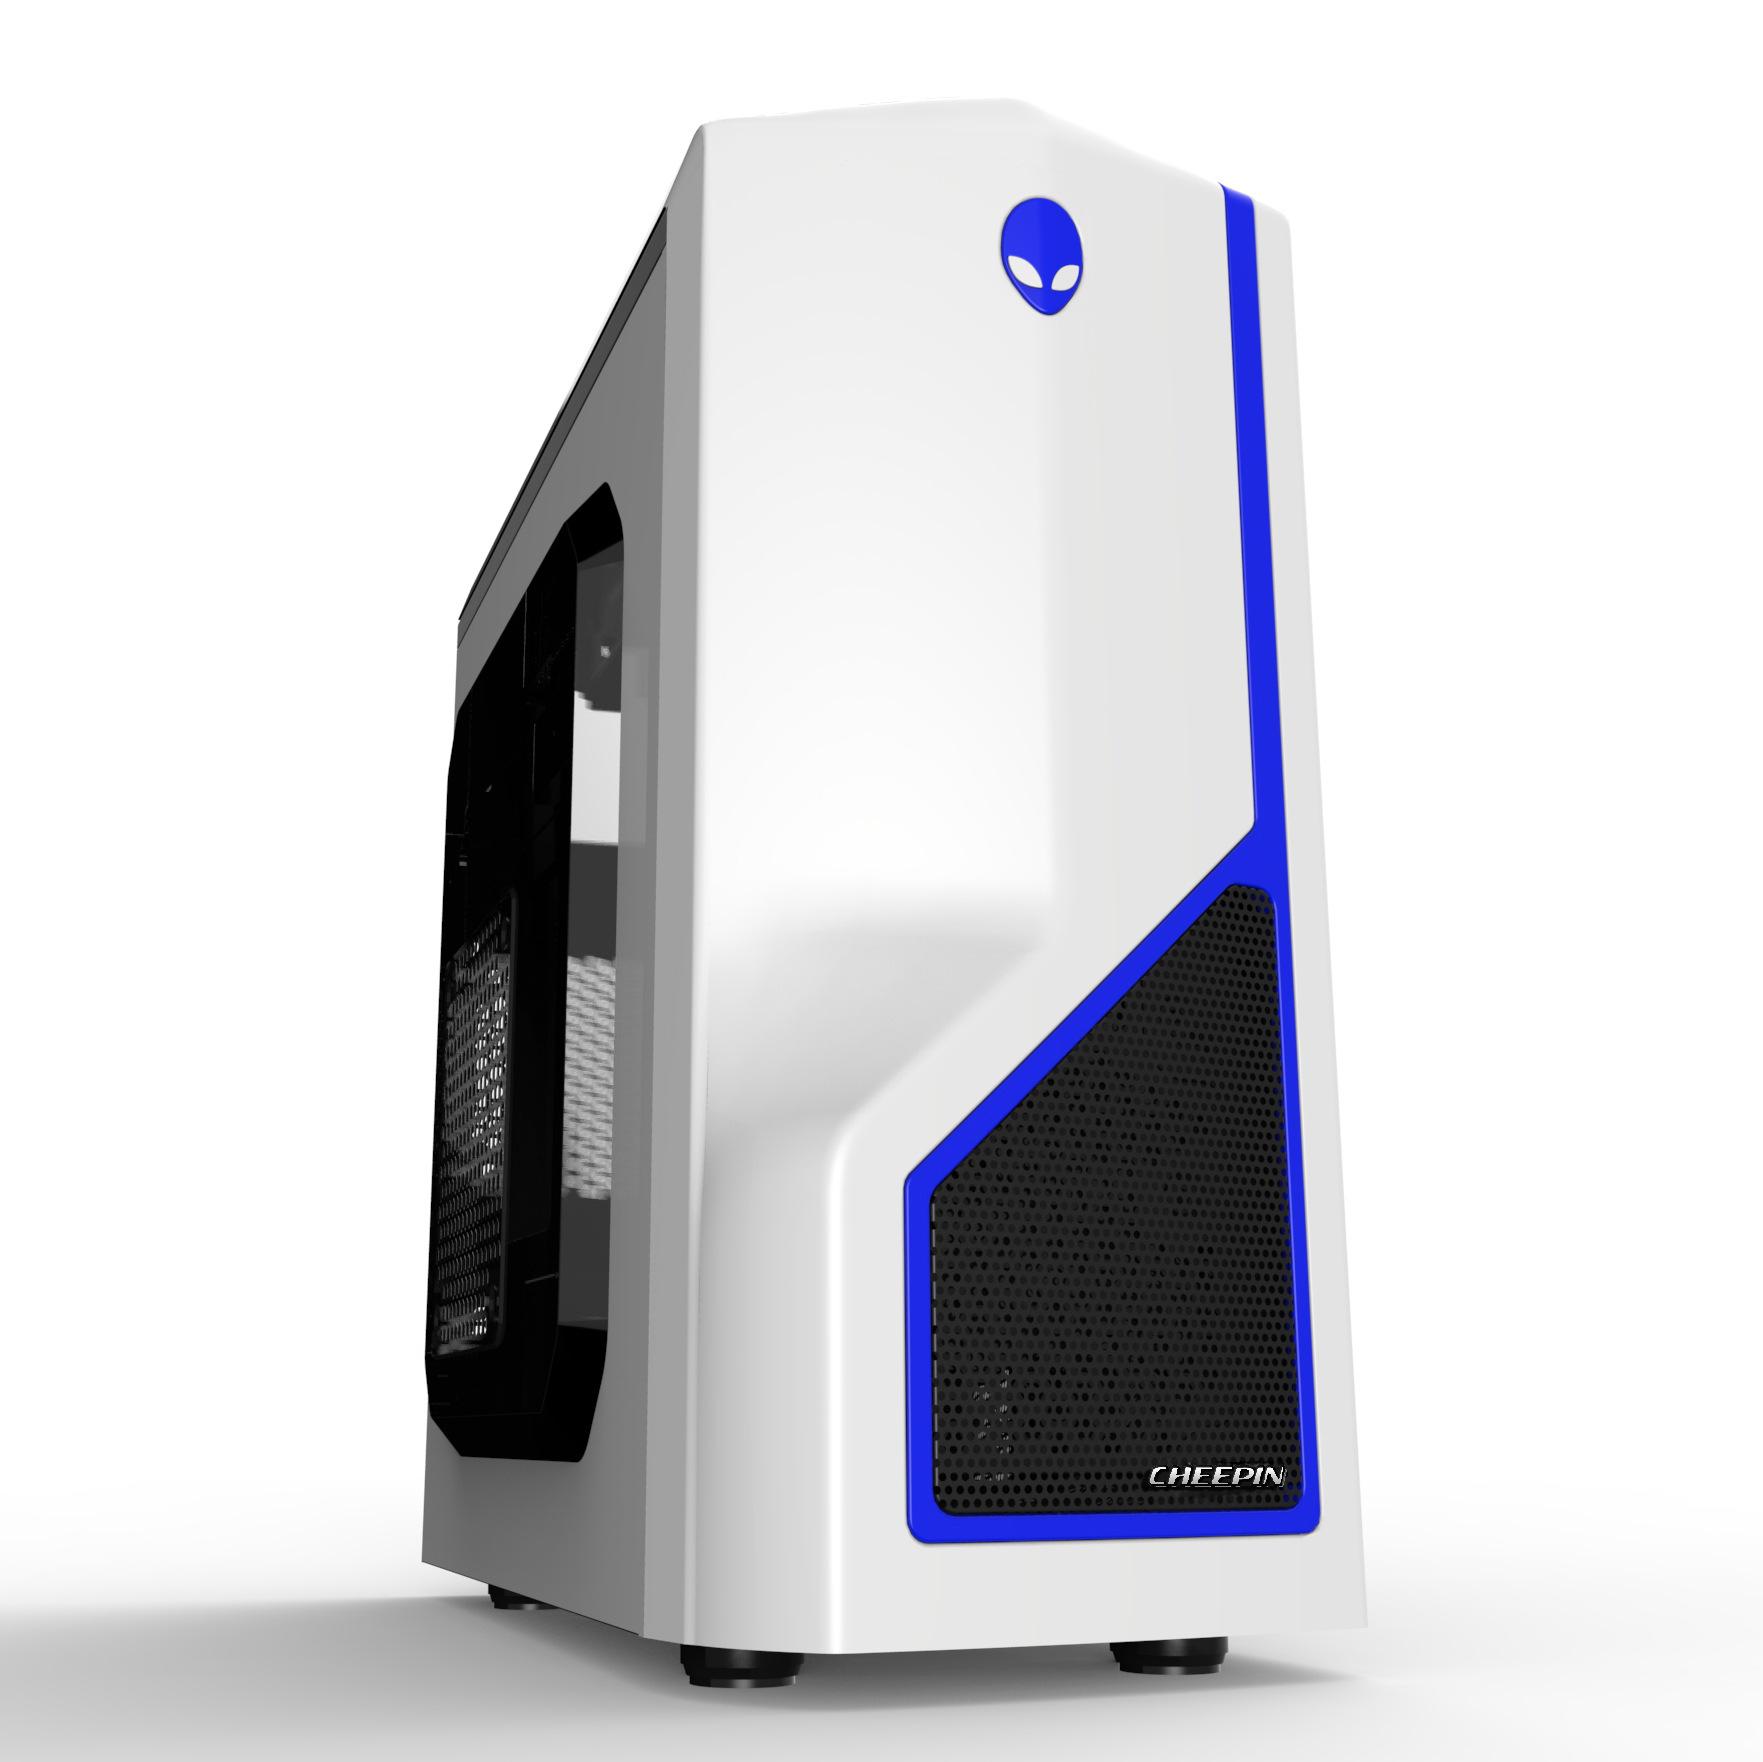 Computer Alien Case,USB 2.0,USB 3.0 MiniATX nas gabinete computador mini itx,2016 New gaming case QingP(China (Mainland))